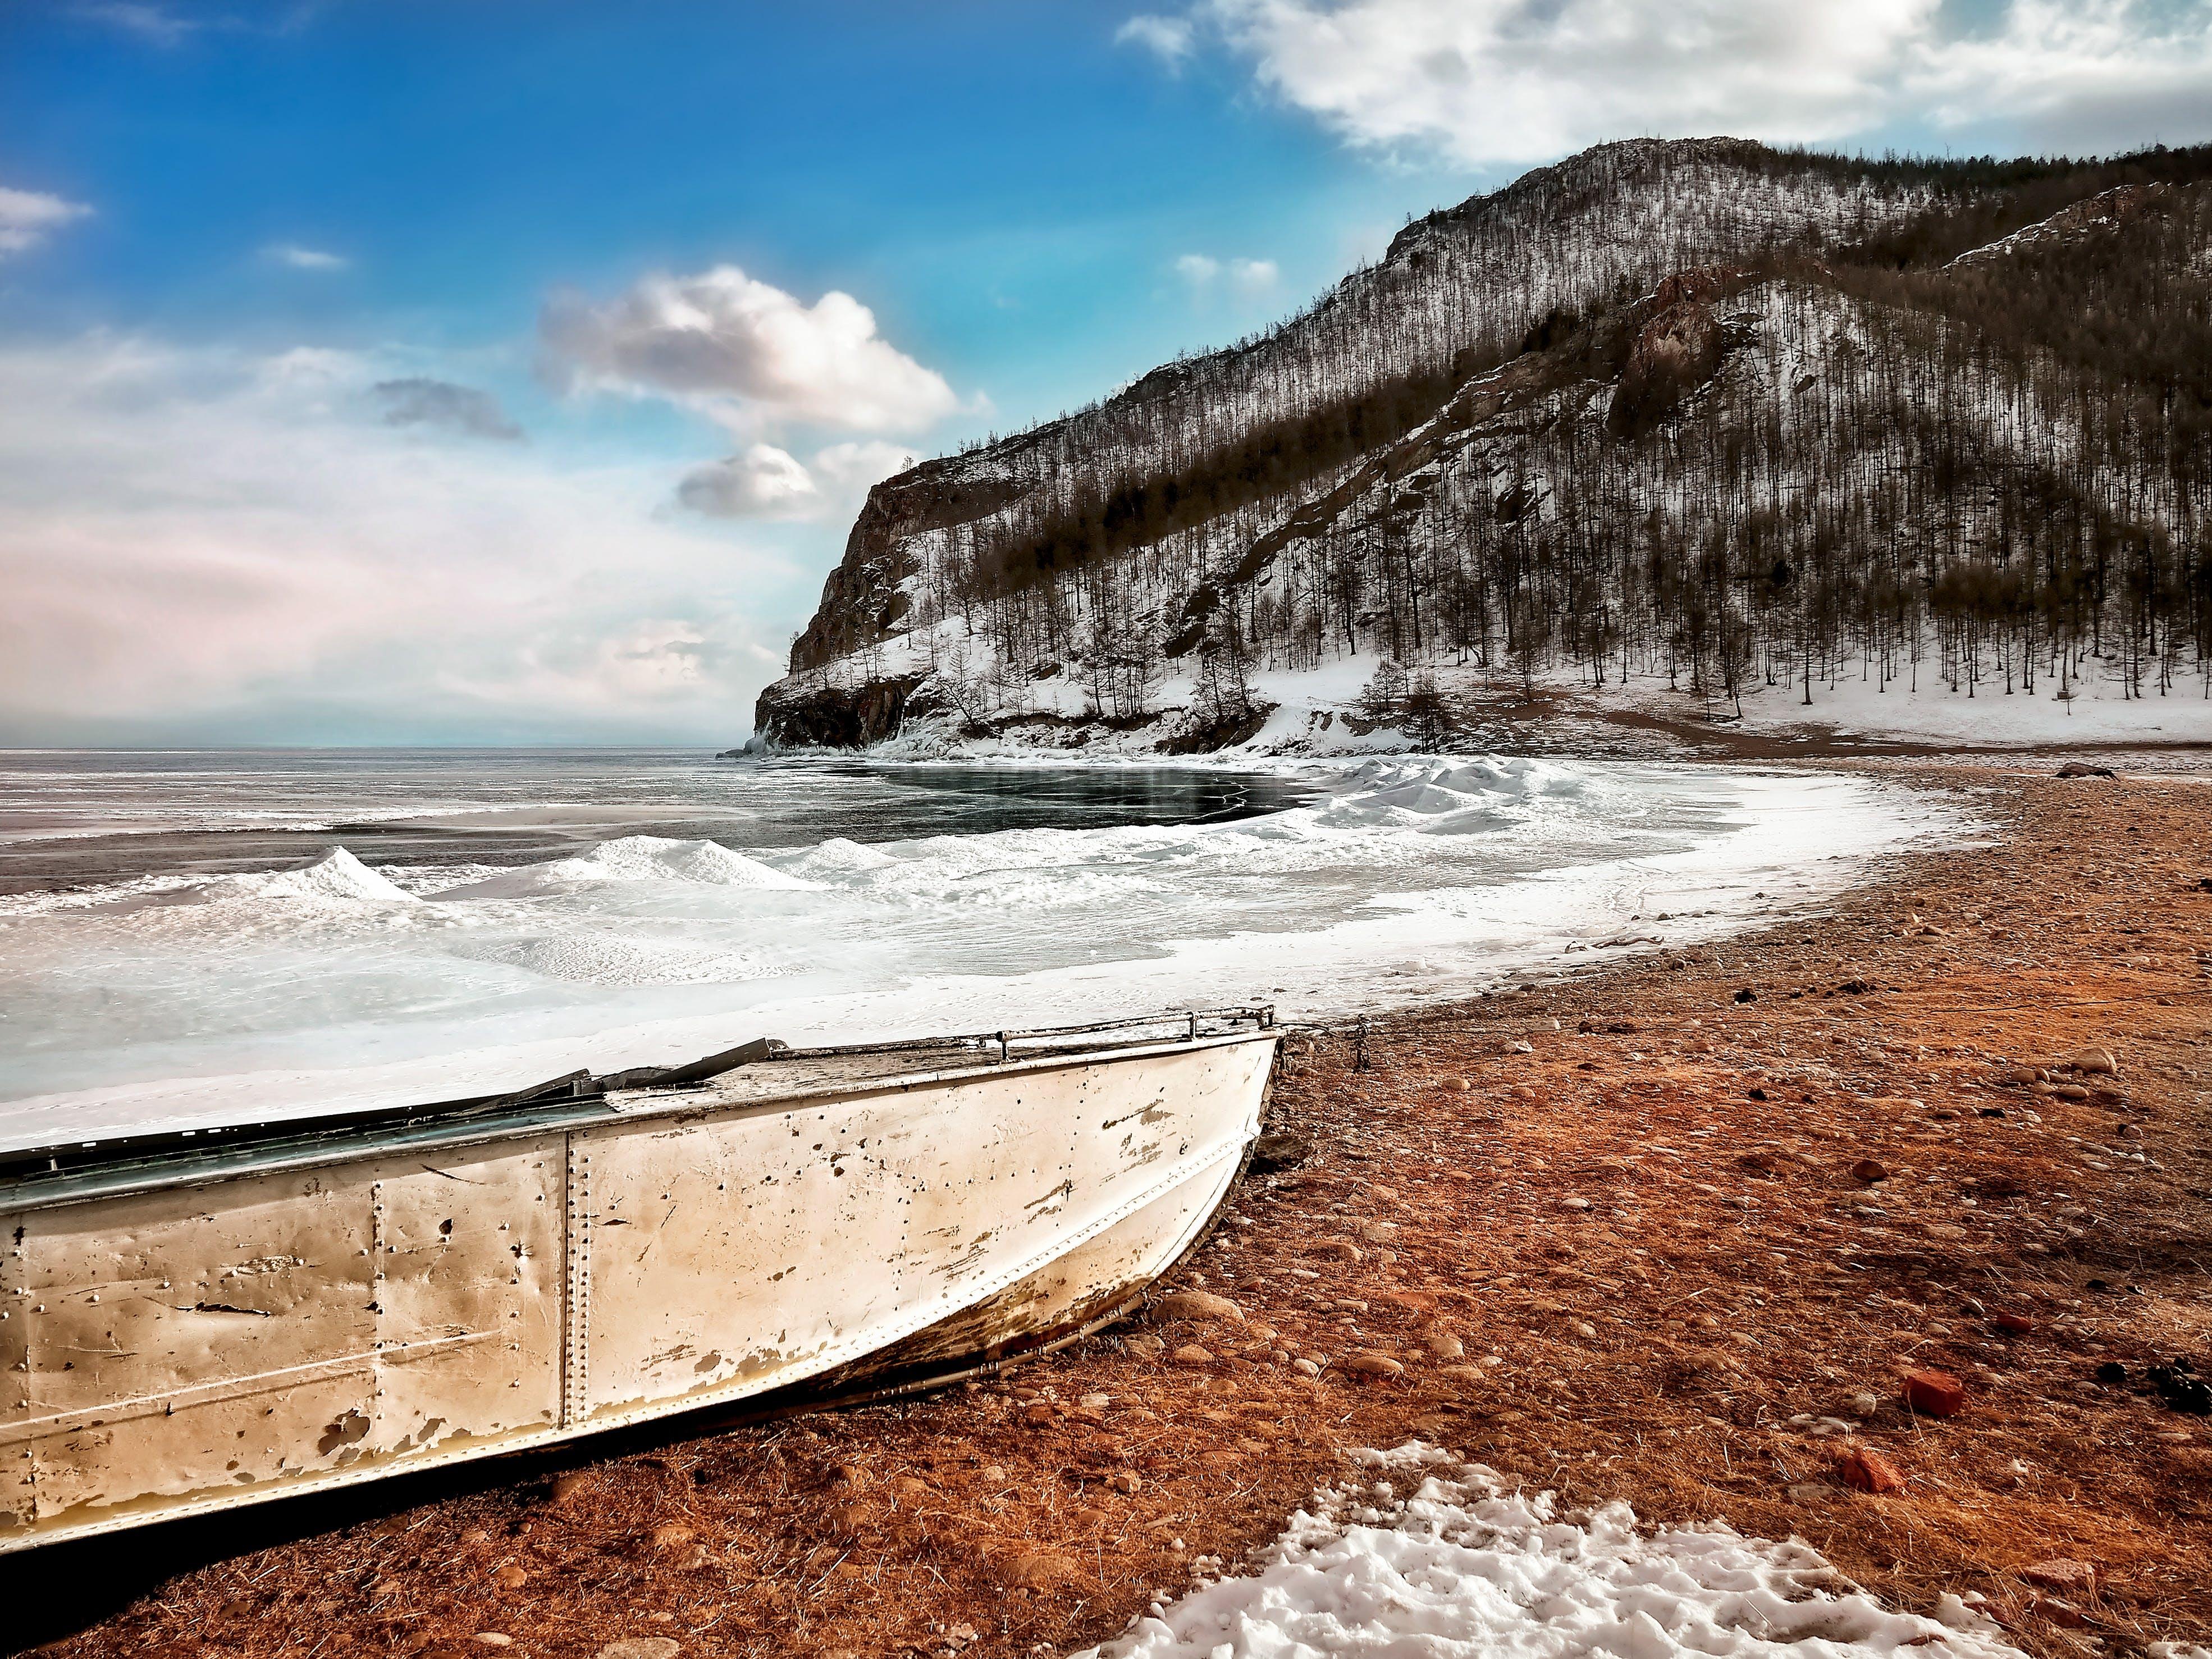 White Boat on Seashore Near Mountain Under White and Blue Sky